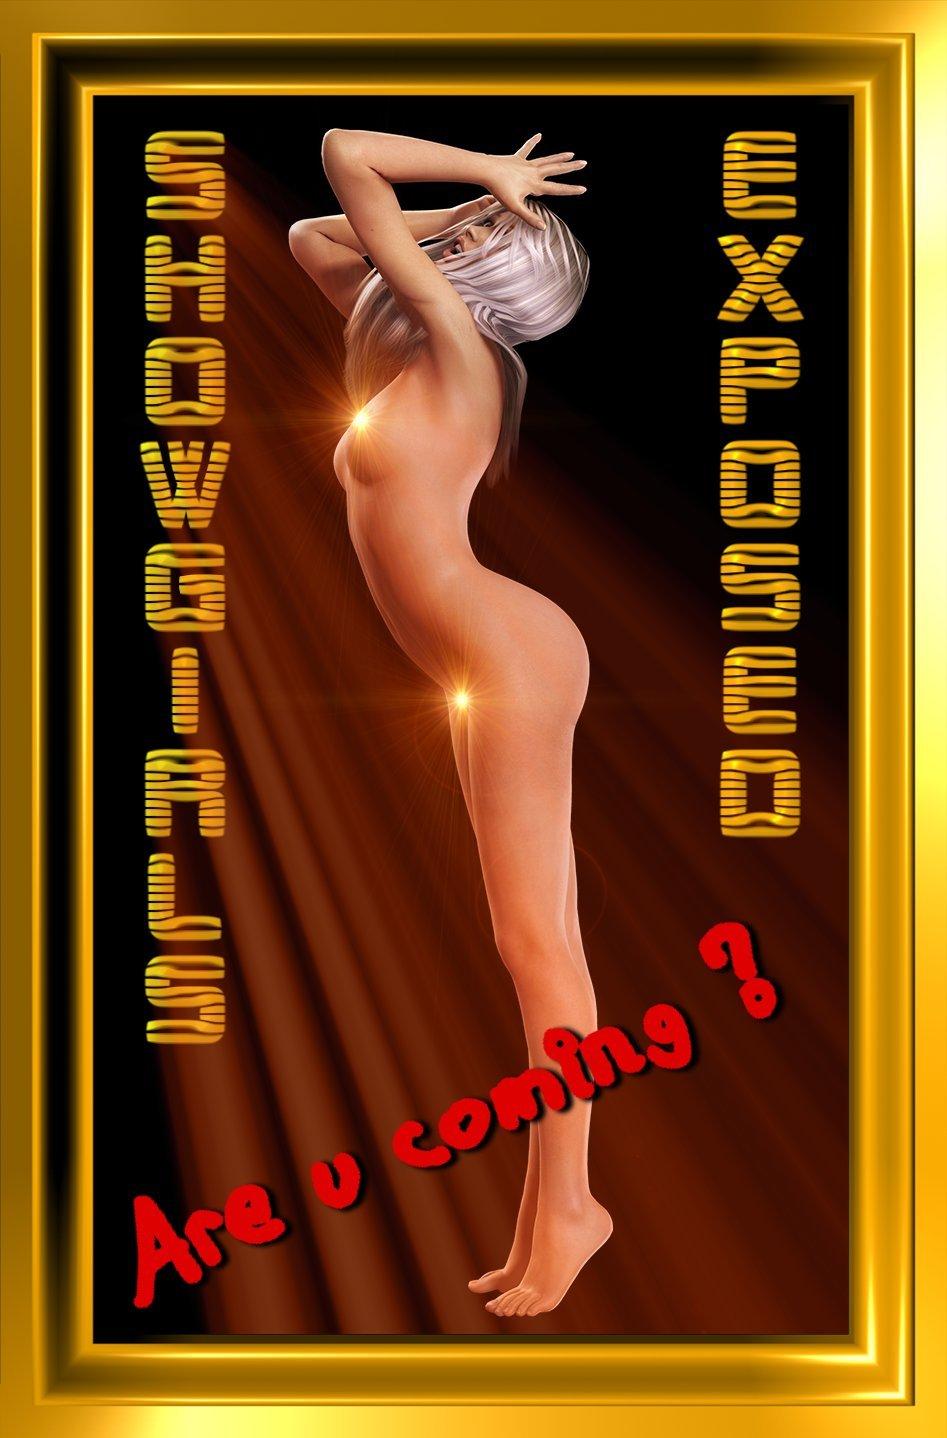 Showgirls: Exposed (2010)